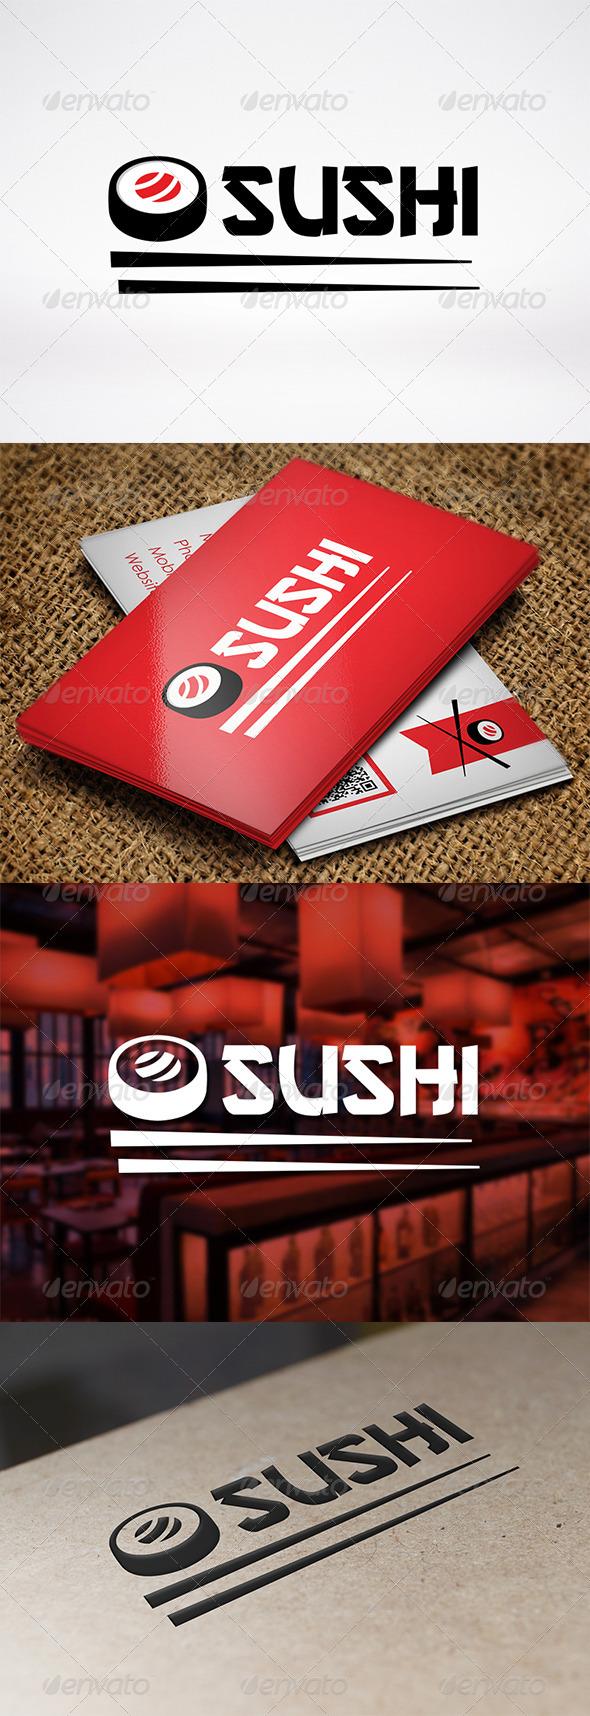 GraphicRiver Sushi Logo Template 7193771